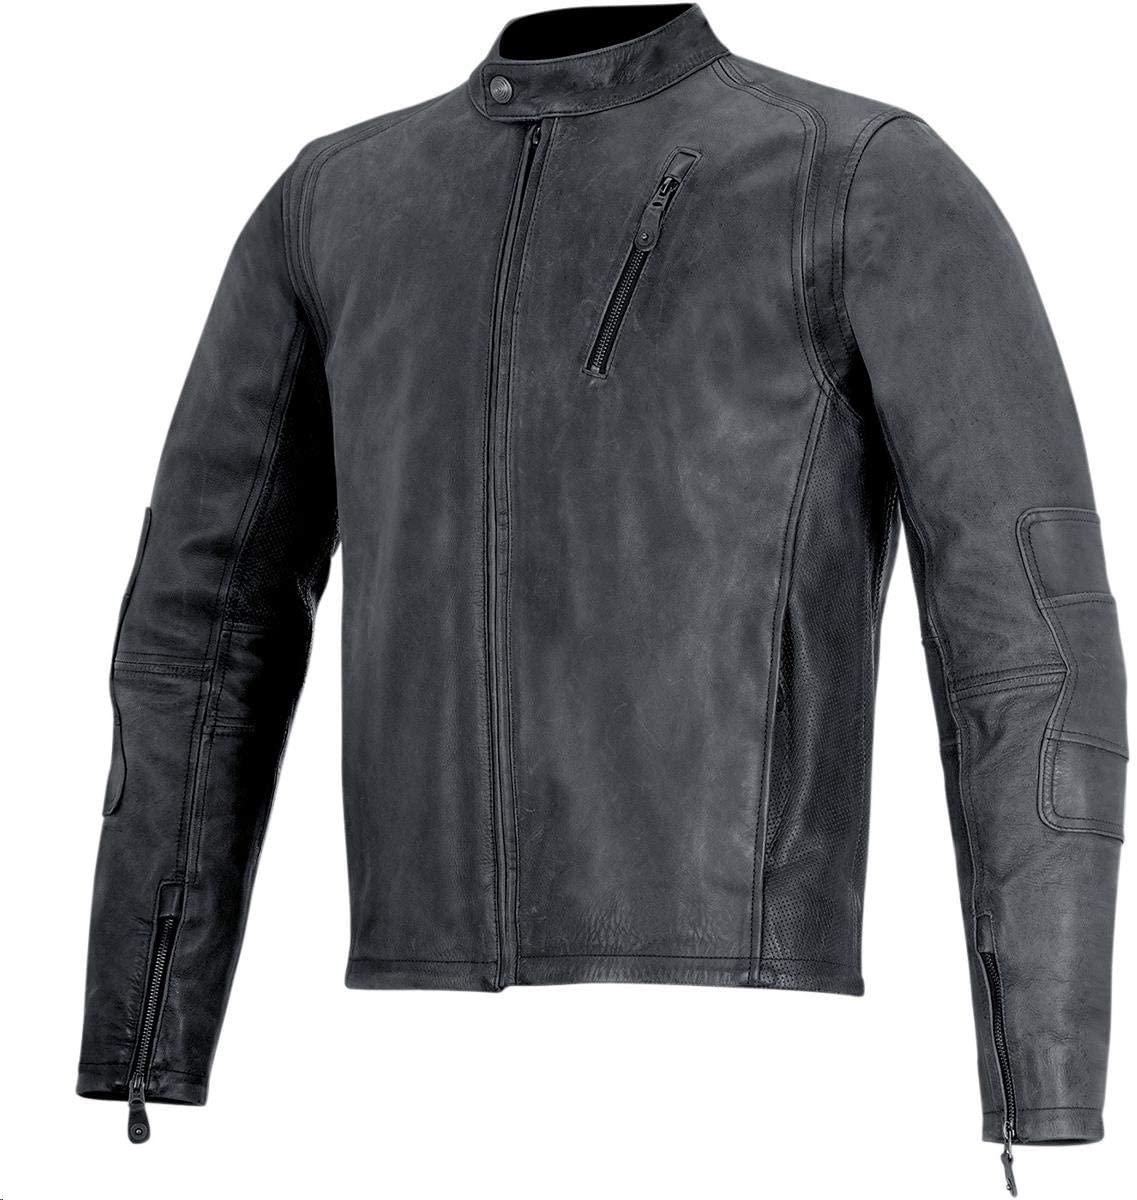 Alpinestars Oscar Monty Men's Street Motorcycle Jackets - Black/Medium